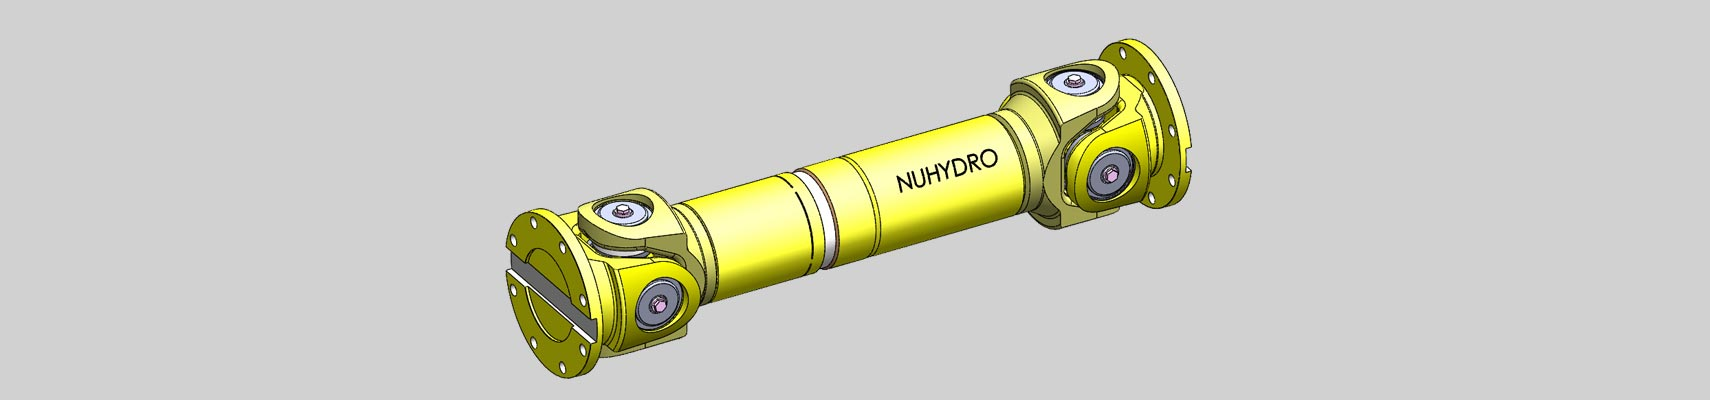 Nuhydro Capabilities